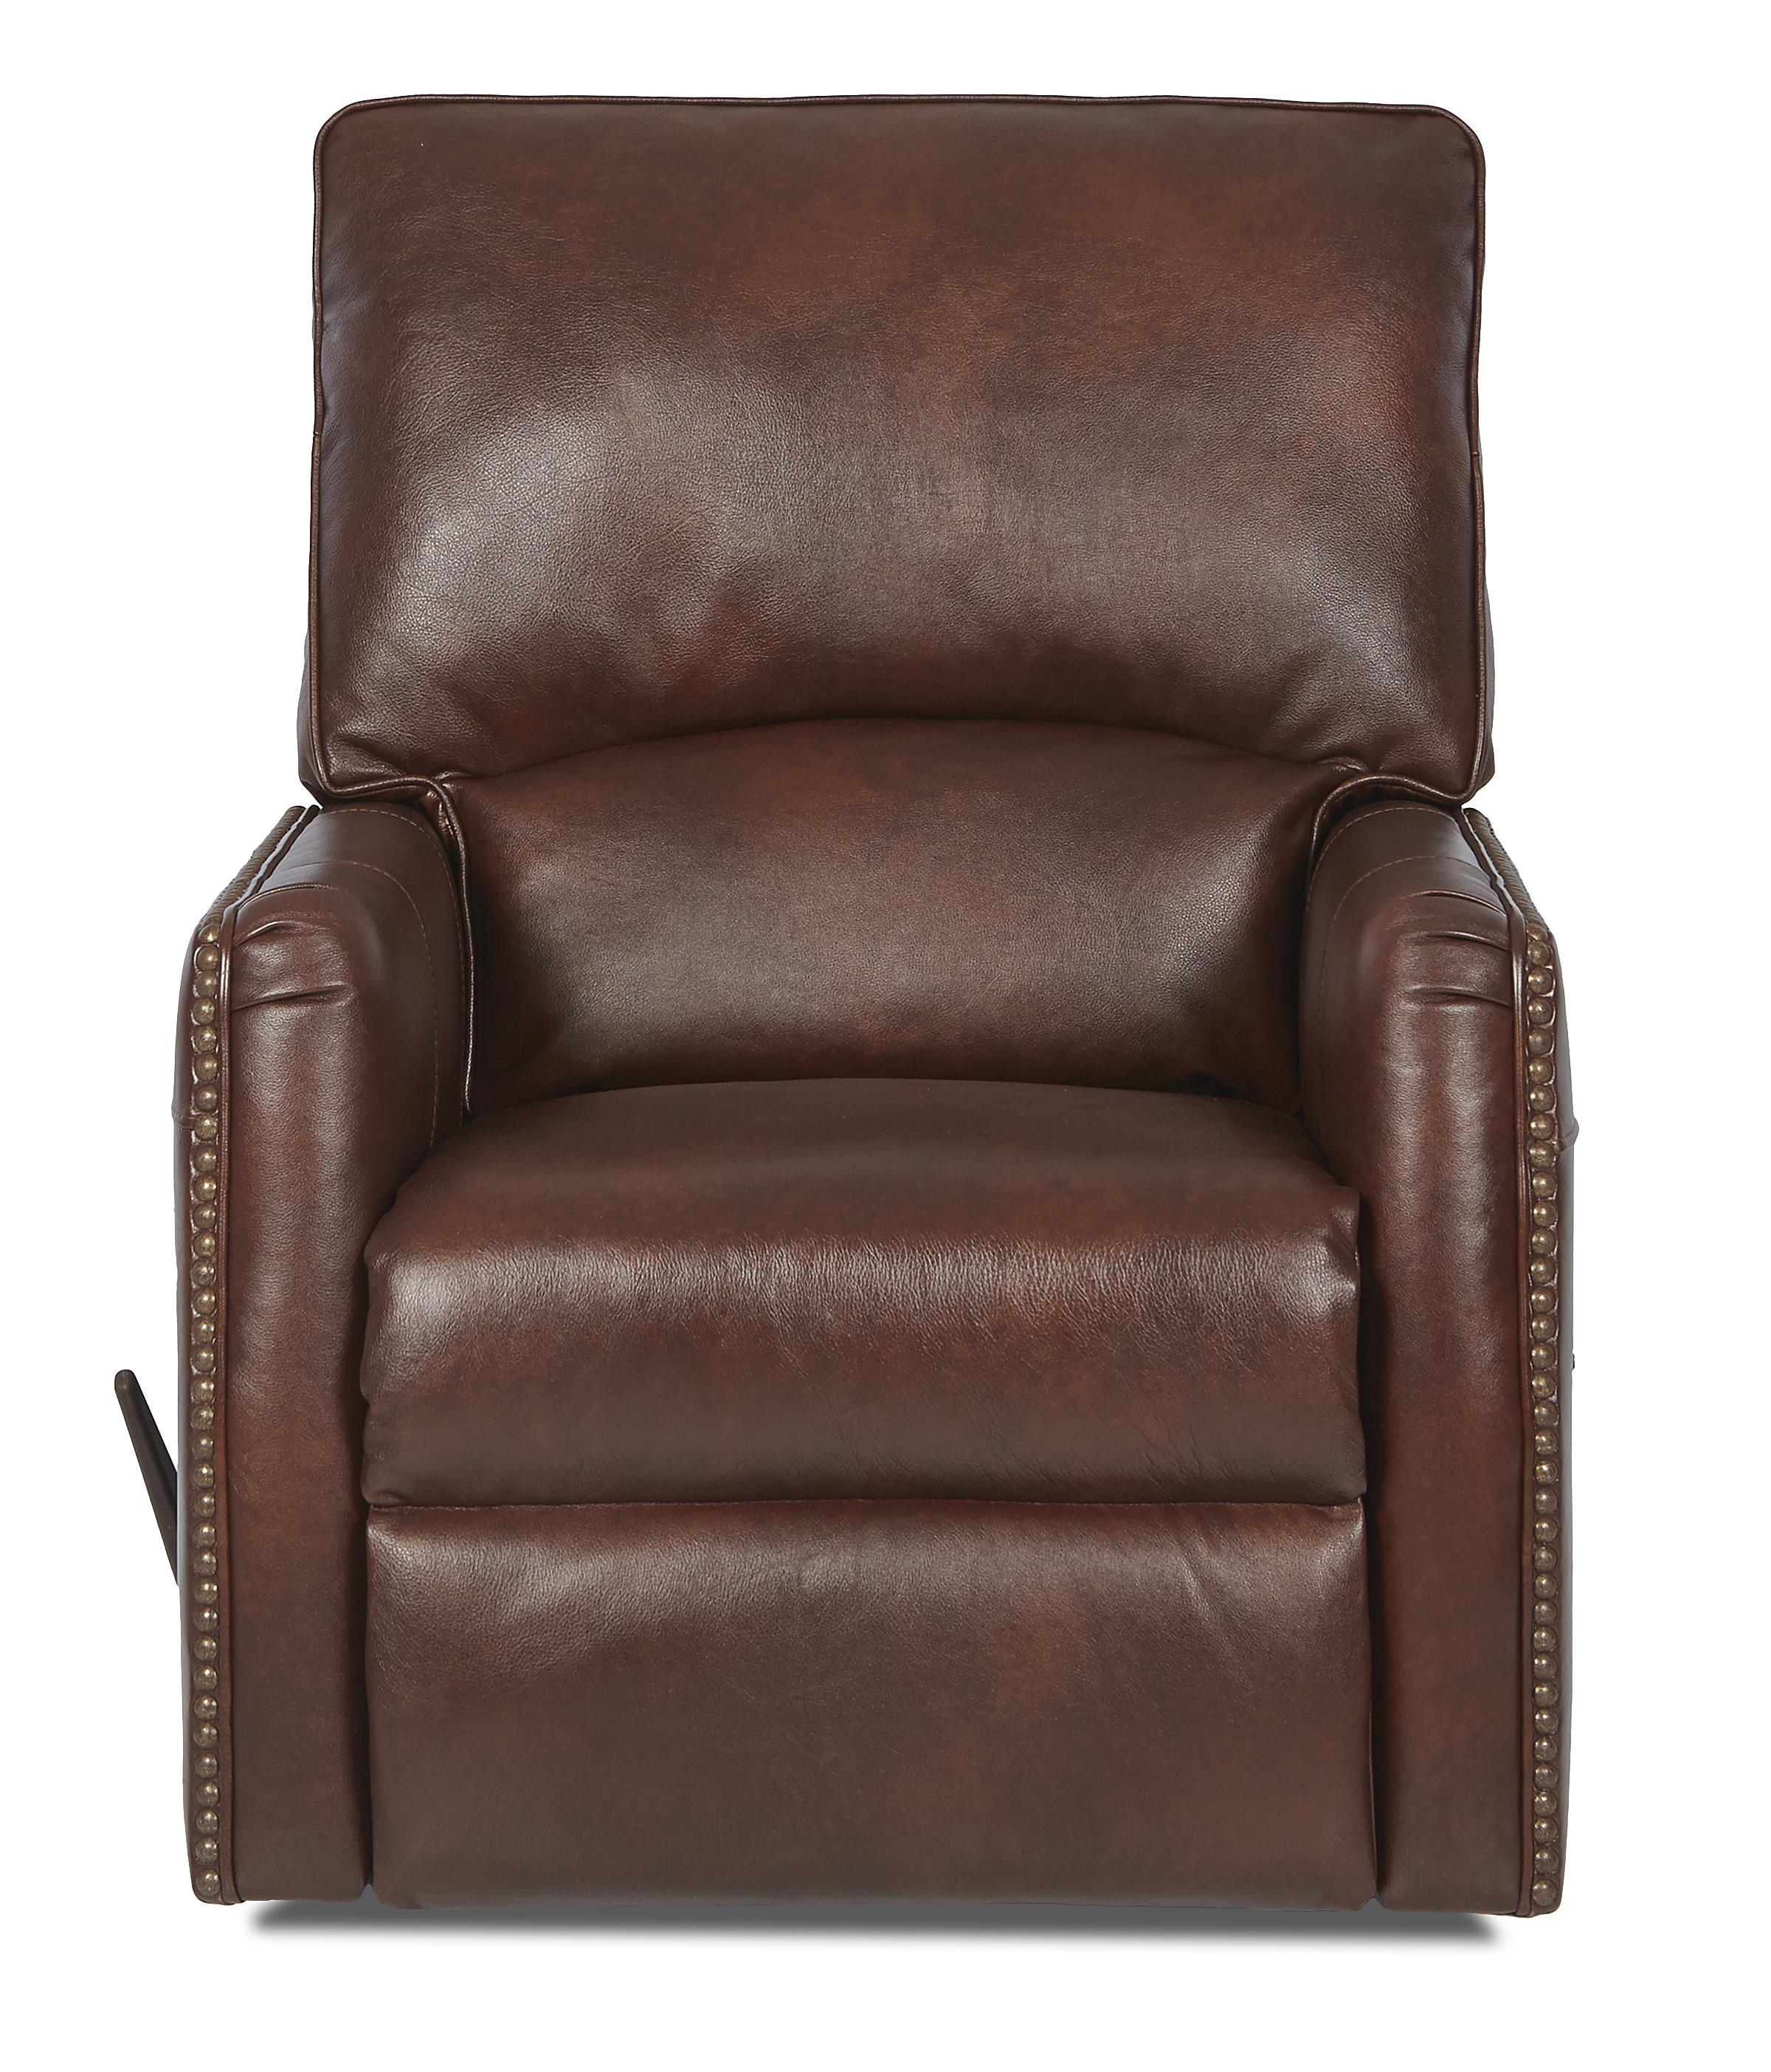 Elliston Place VeniceTraditional Swivel Rocking Reclining Chair